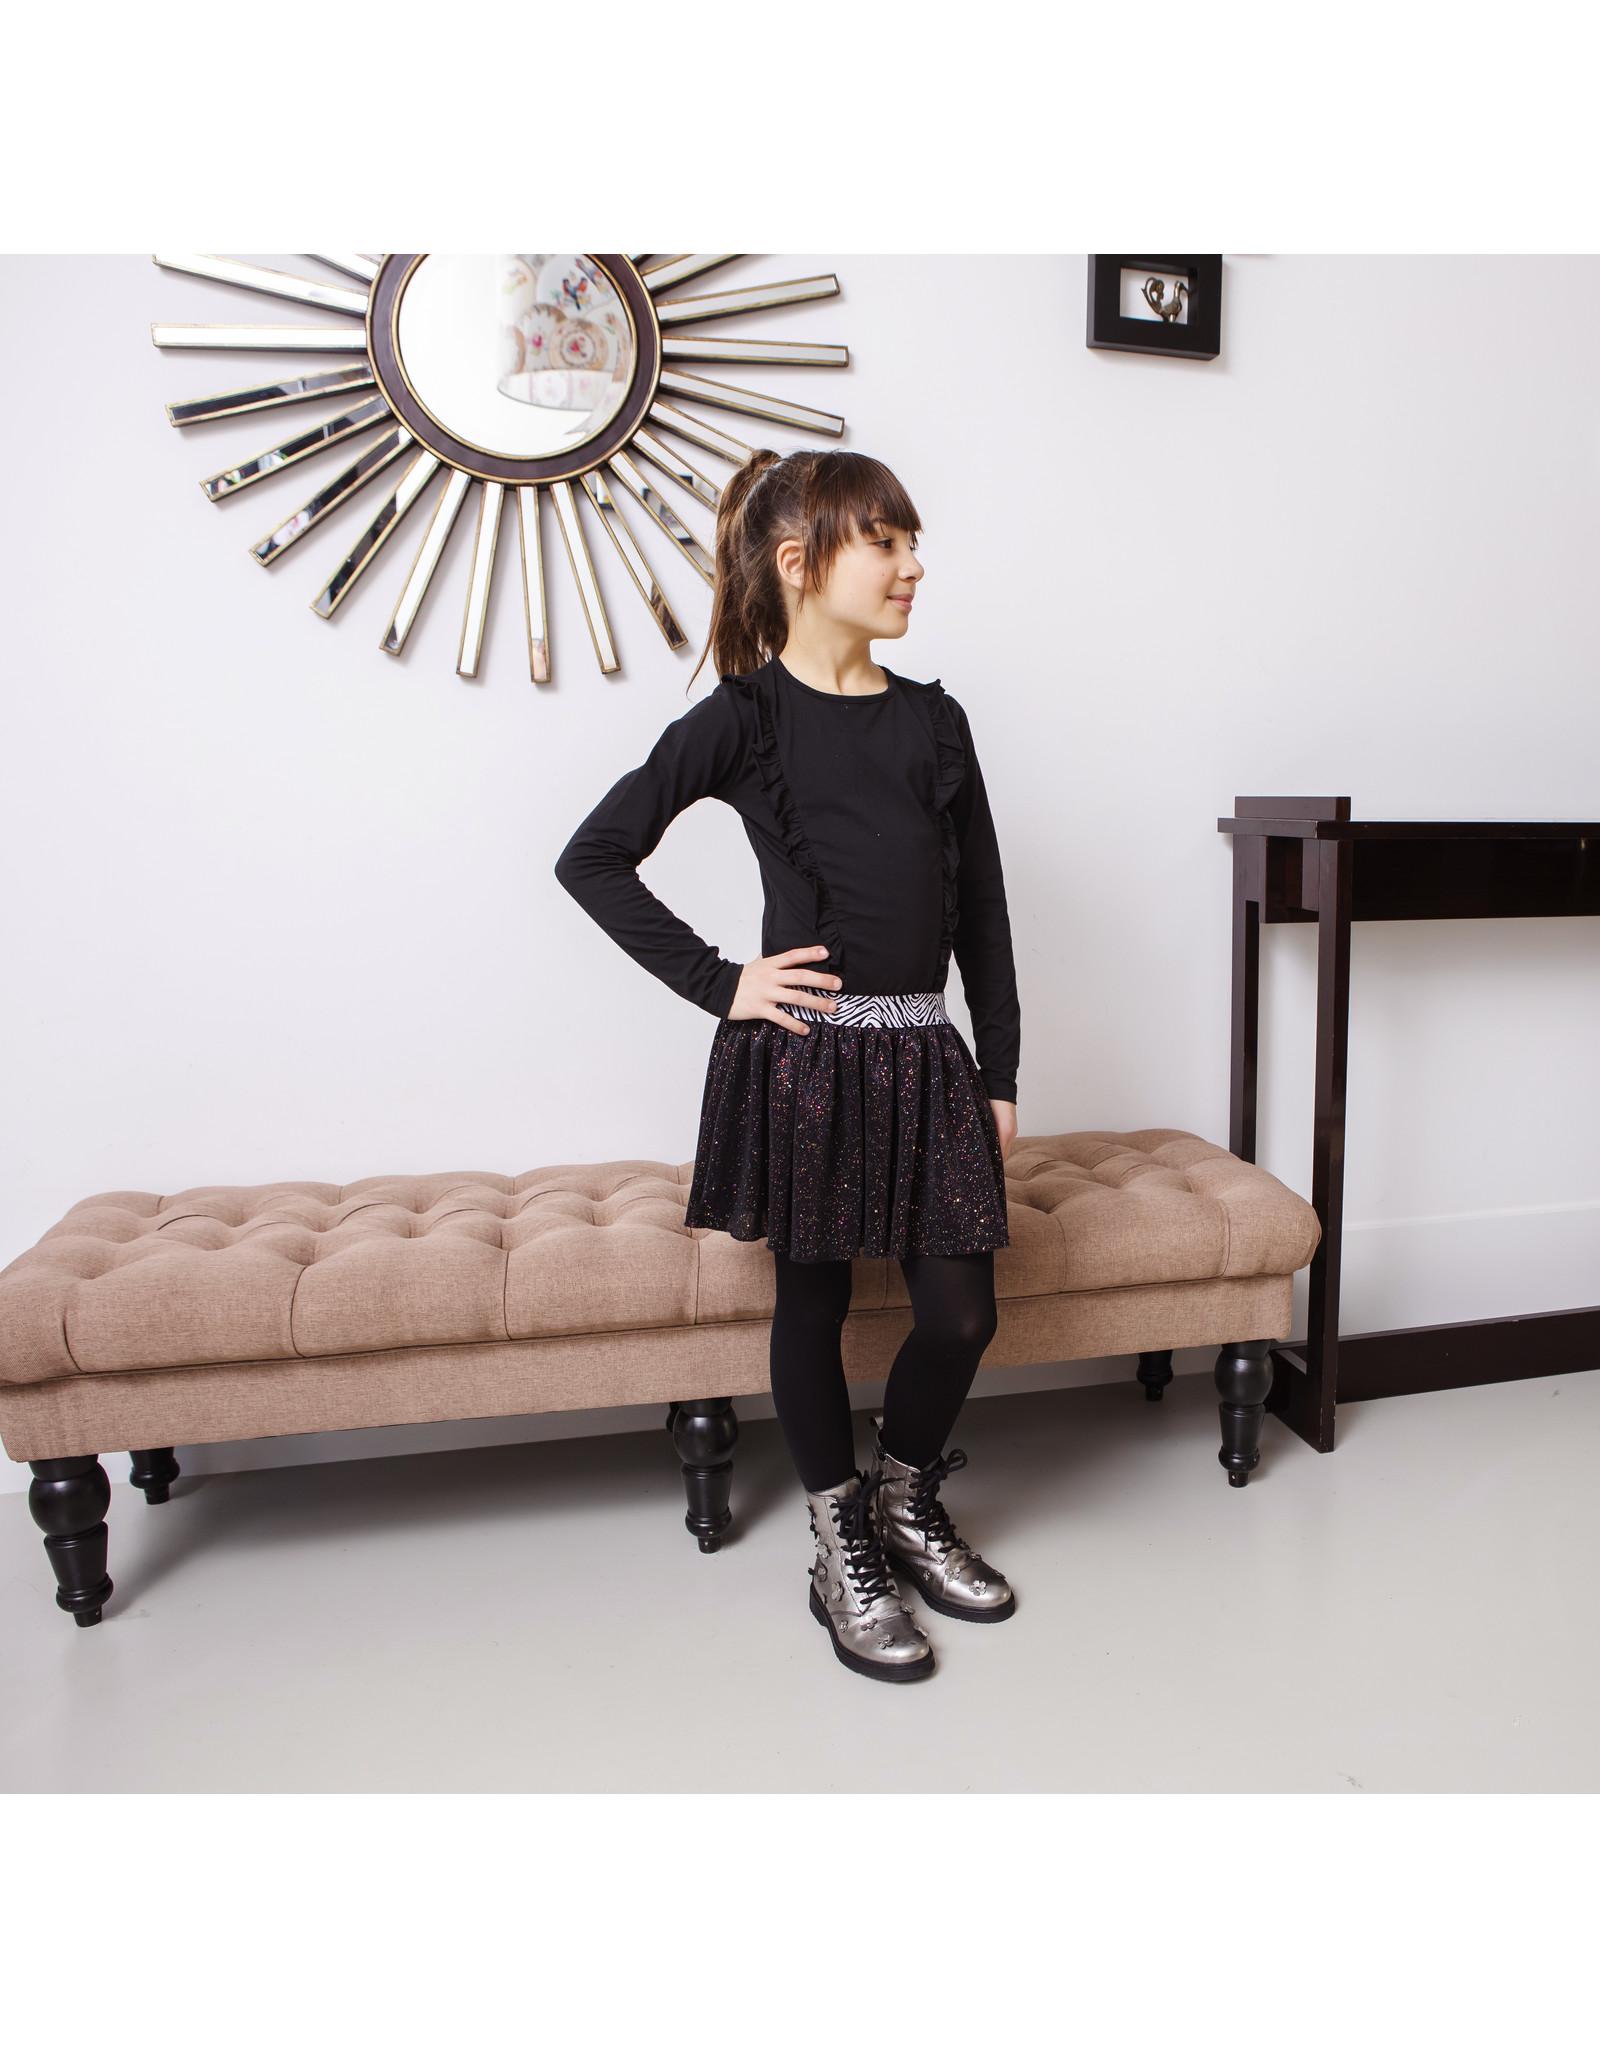 B-Nosy Girls dress with flock aop top and sequince skirt, Black zebra